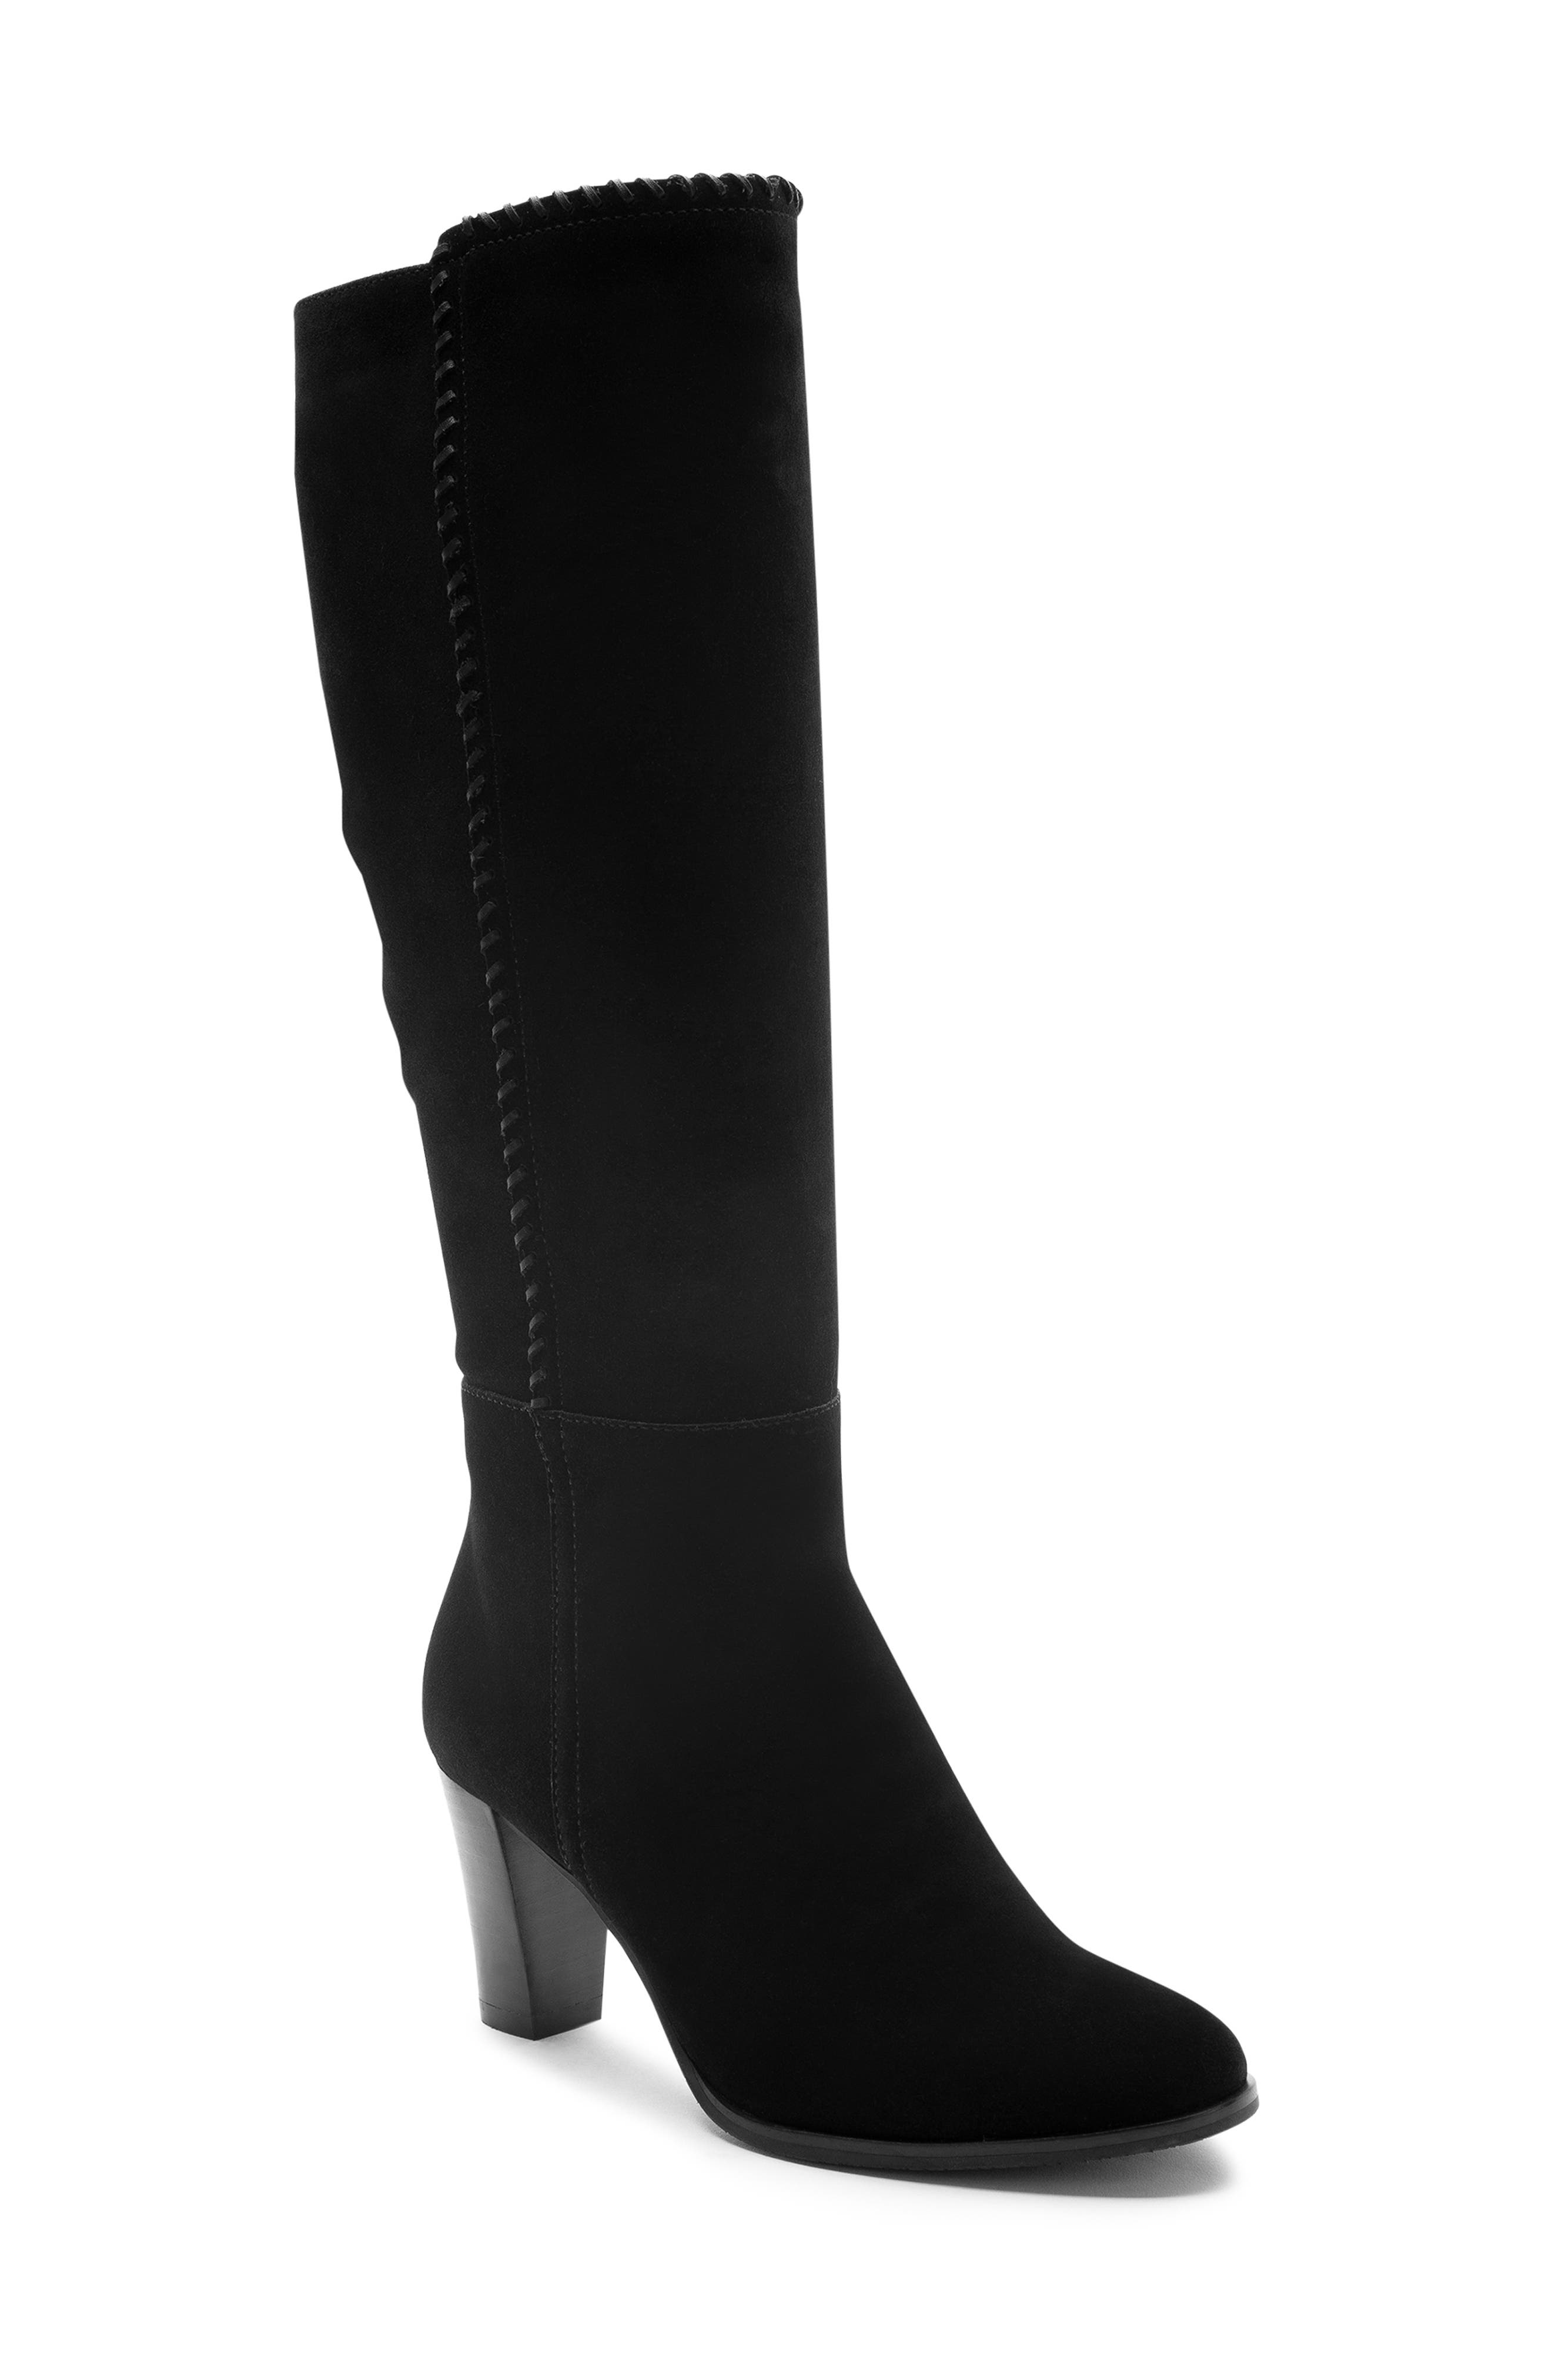 Edith Knee-High Waterproof Suede Boot,                         Main,                         color, Black Suede